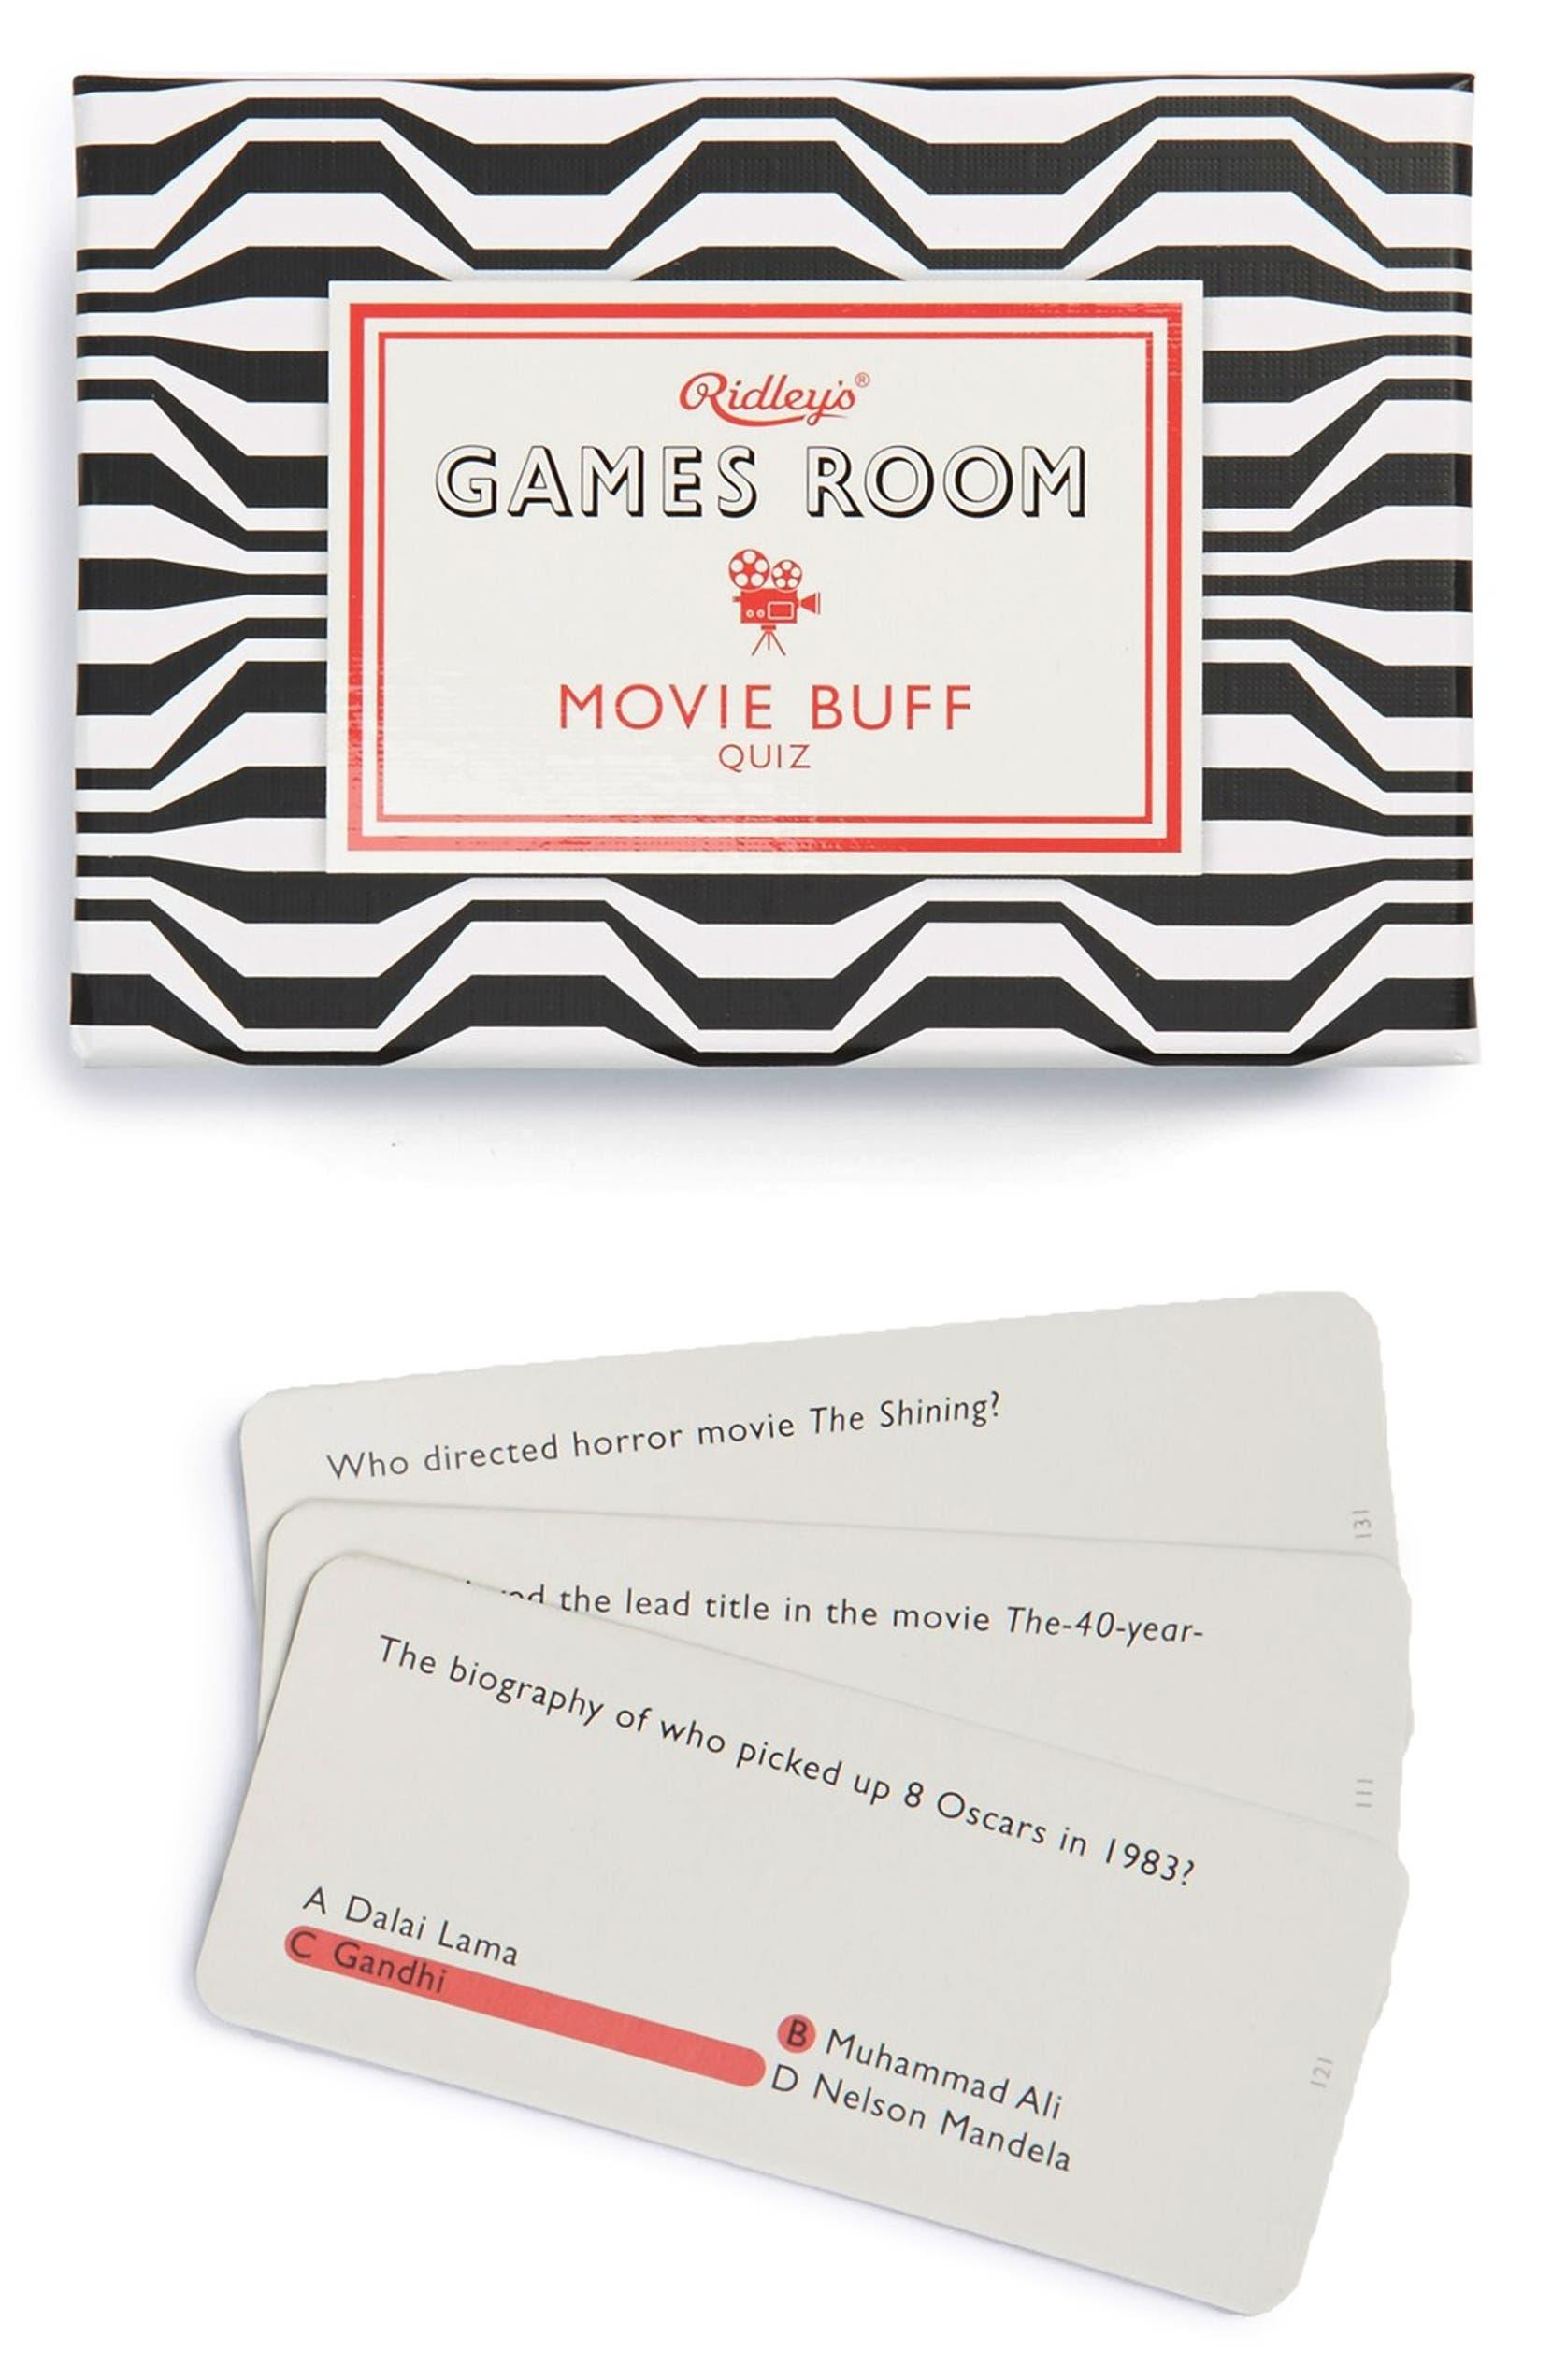 Ridley's Games Room 'Movie Buff' Quiz | Nordstrom